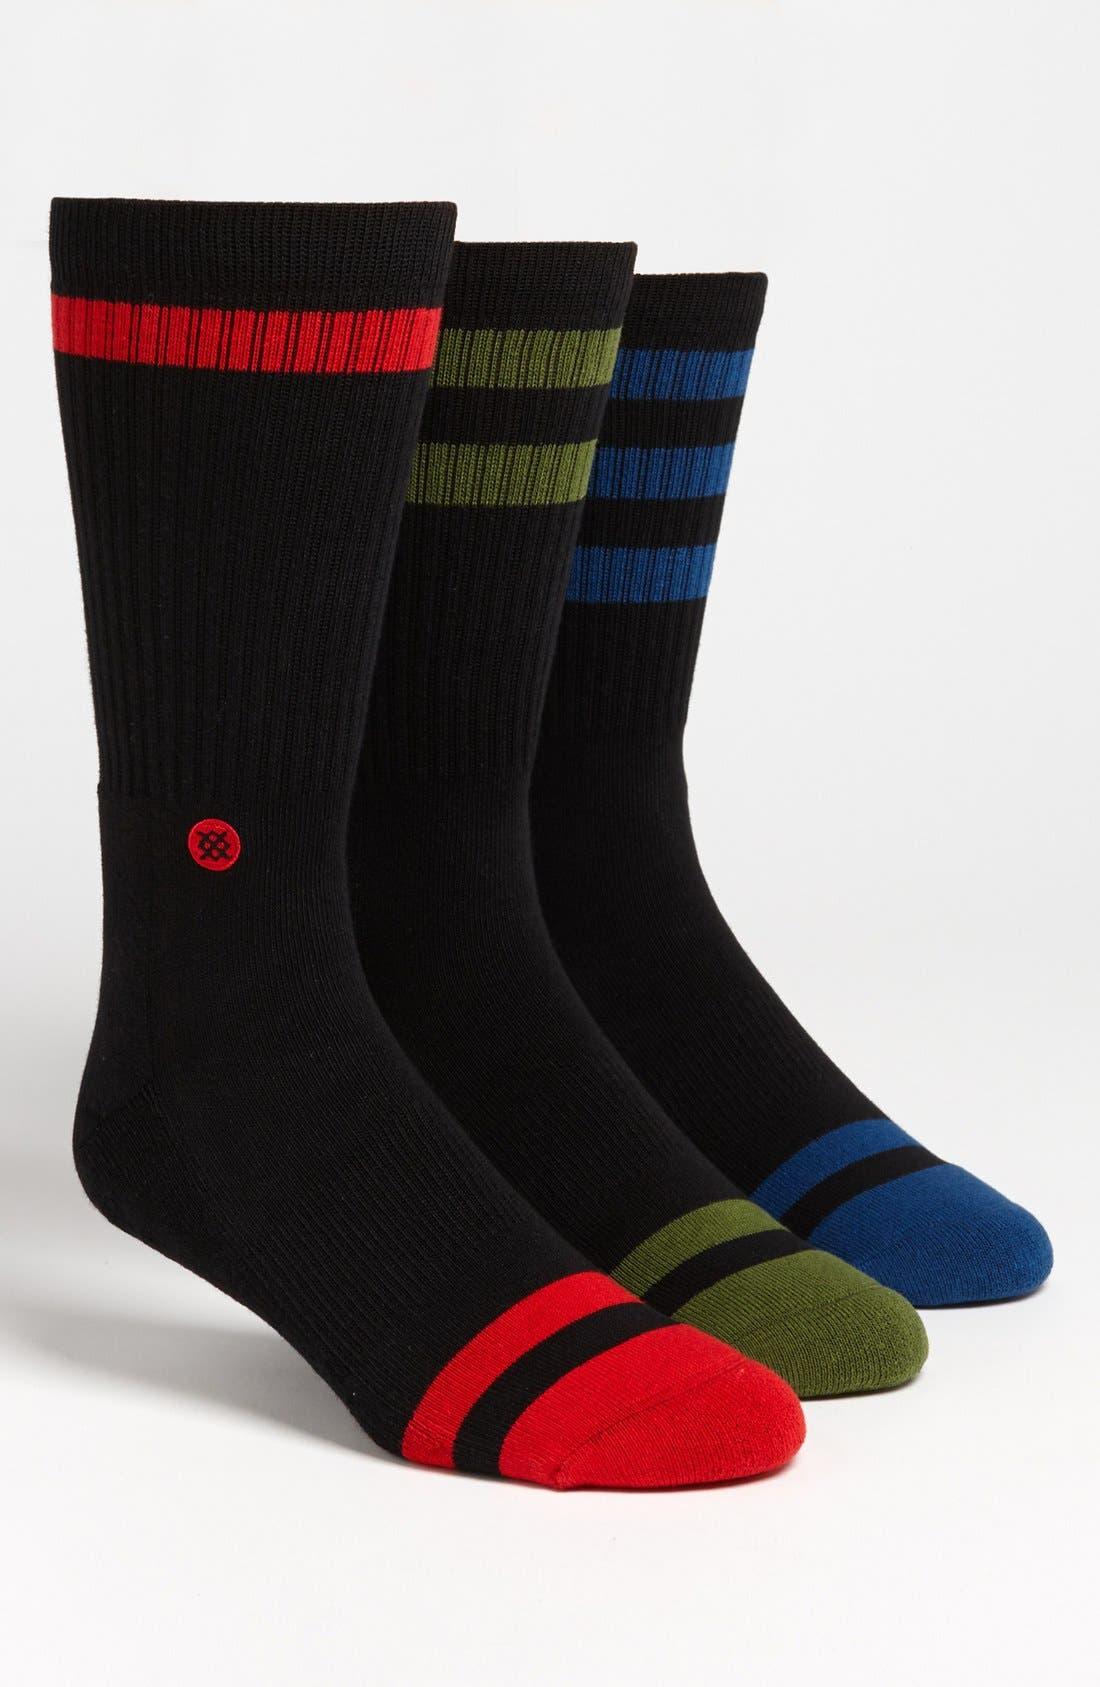 Alternate Image 1 Selected - Stance 'Triple Threat' Crew Socks (Set of 3)